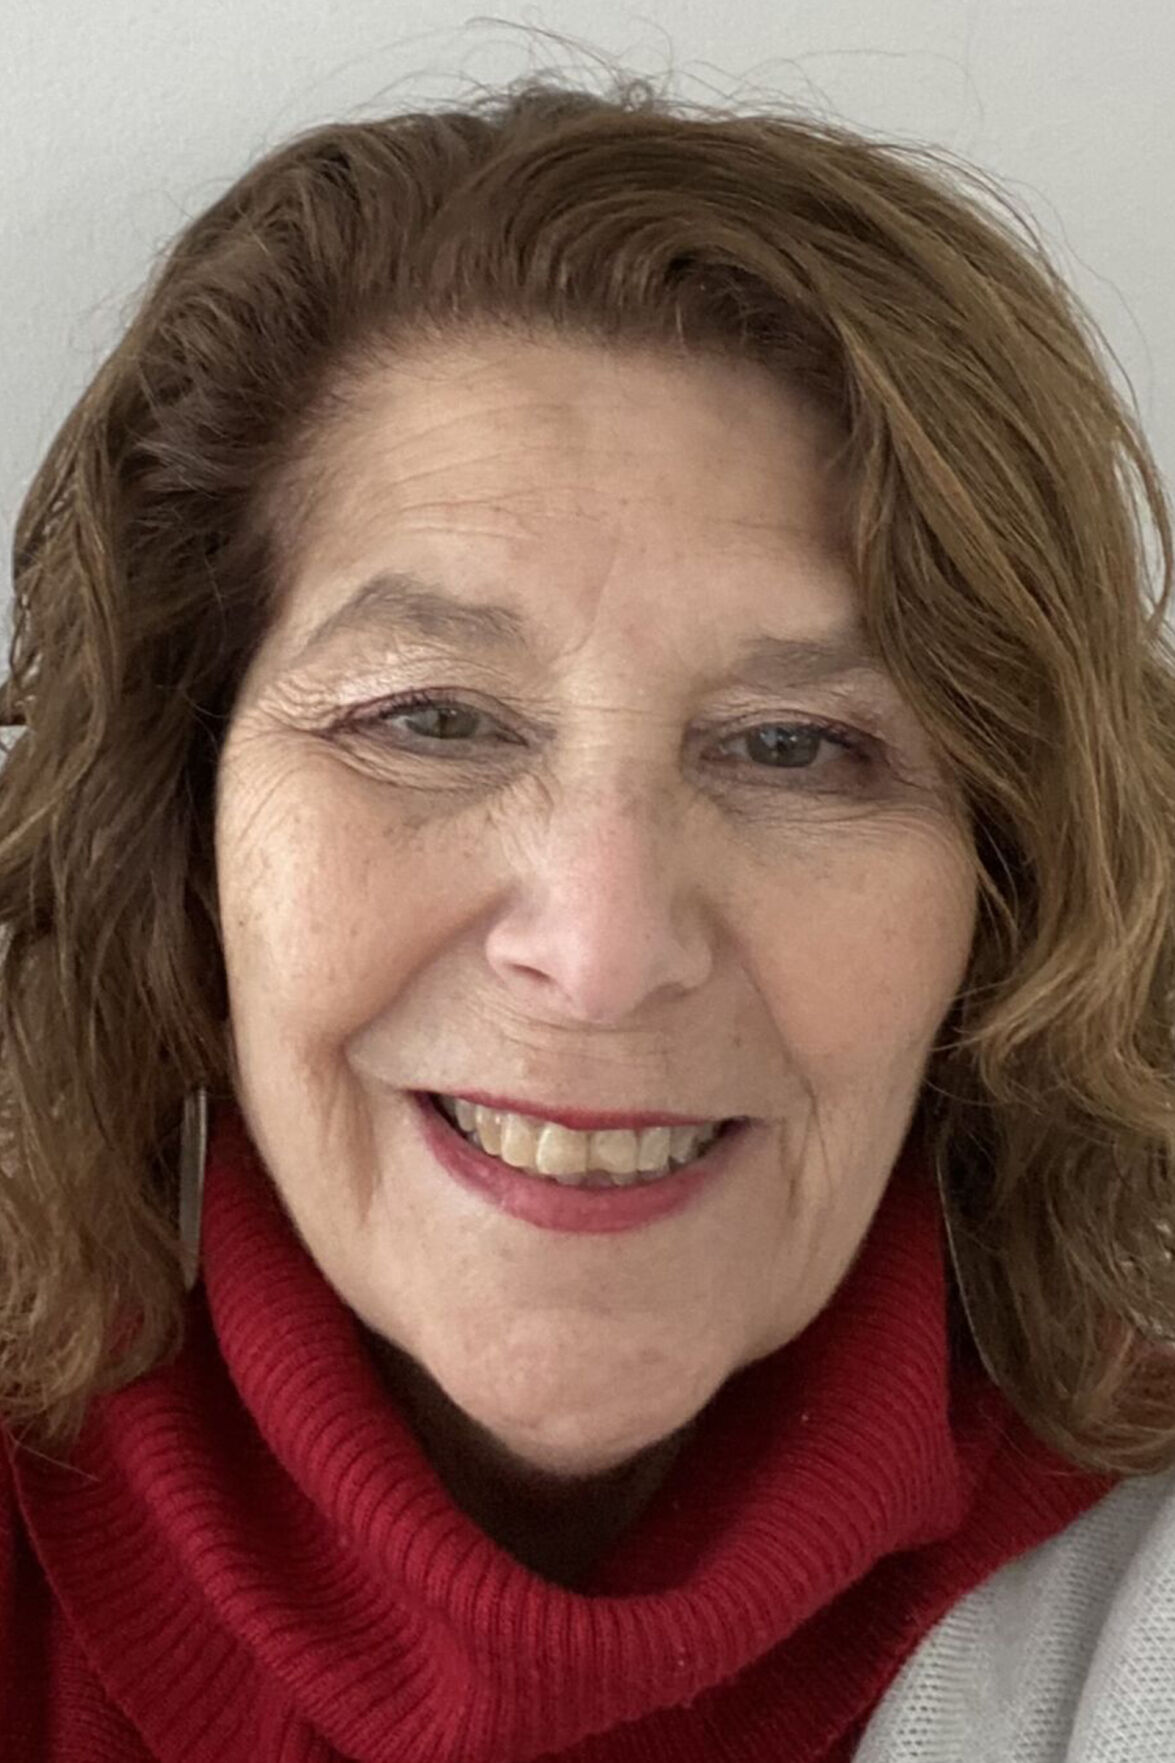 Mindy Feigenbaum